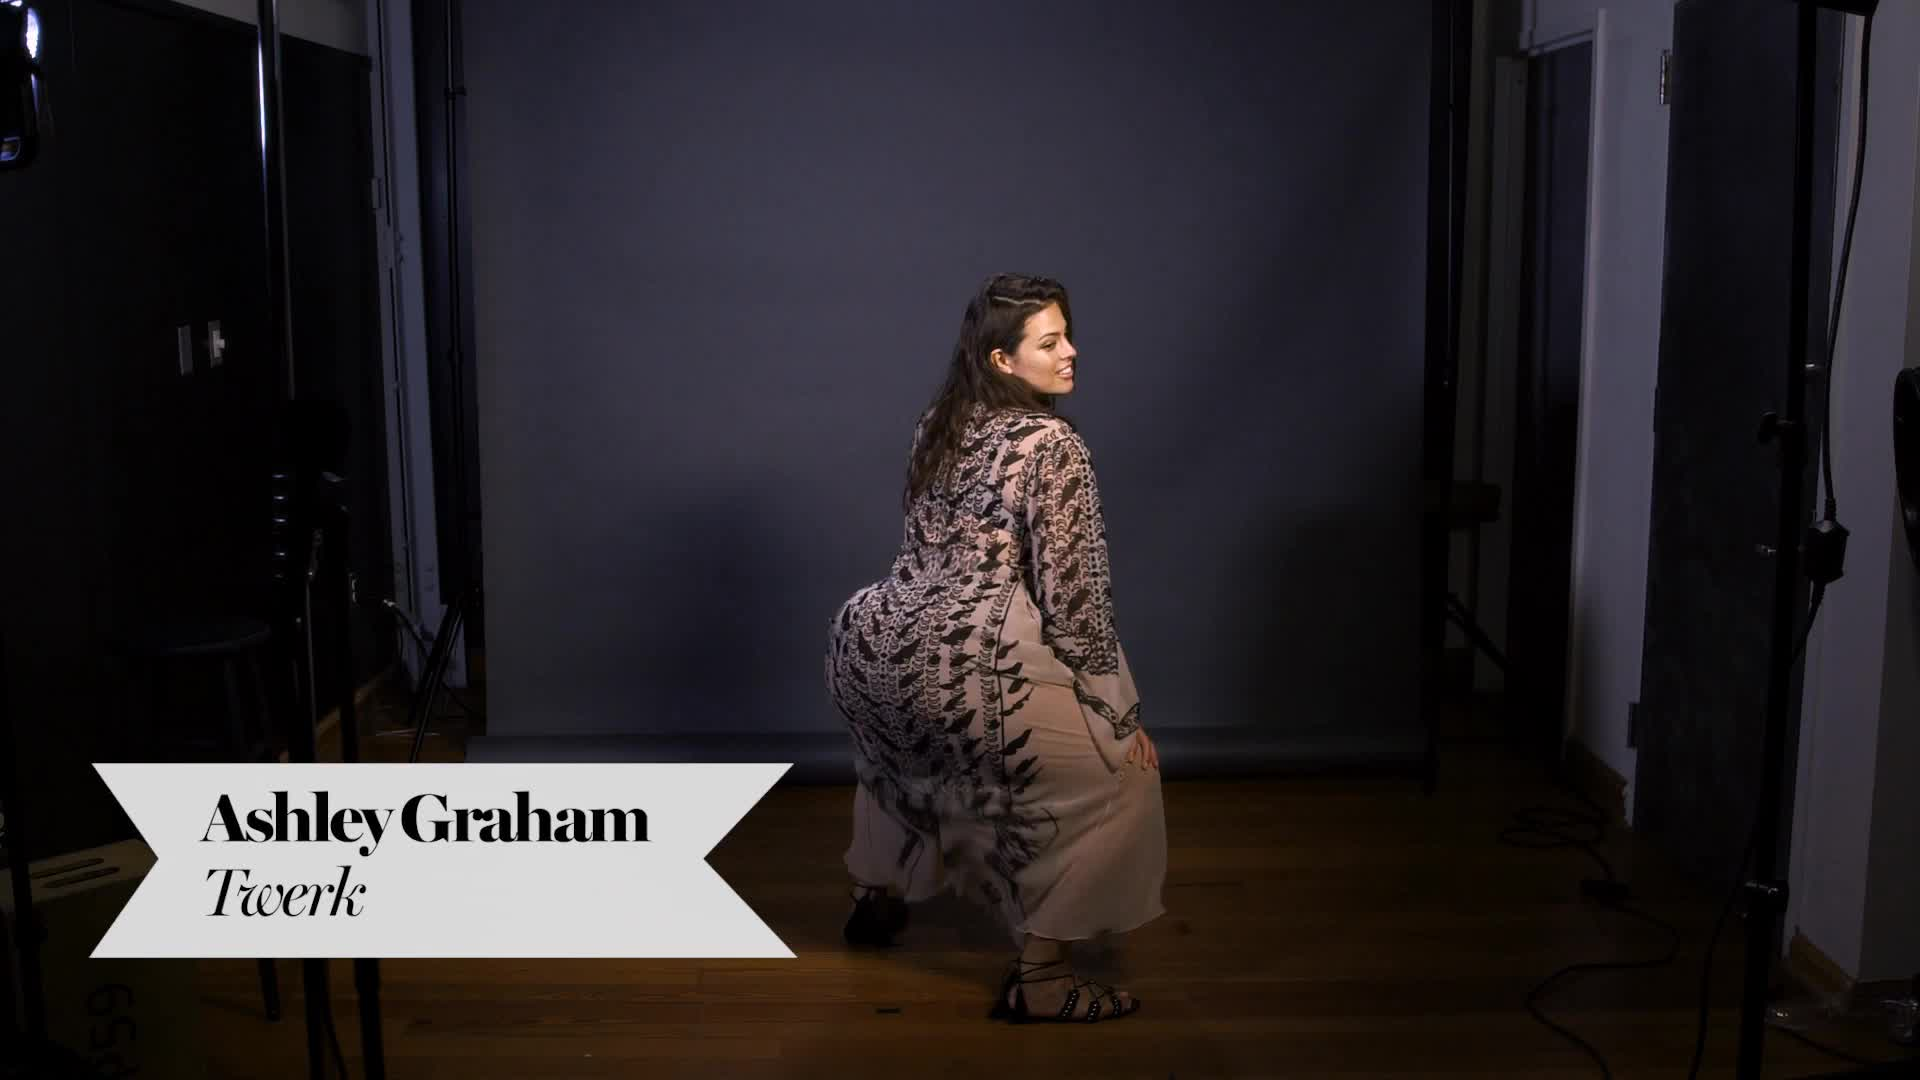 Ashley Graham - Glamour Twerk GIFs